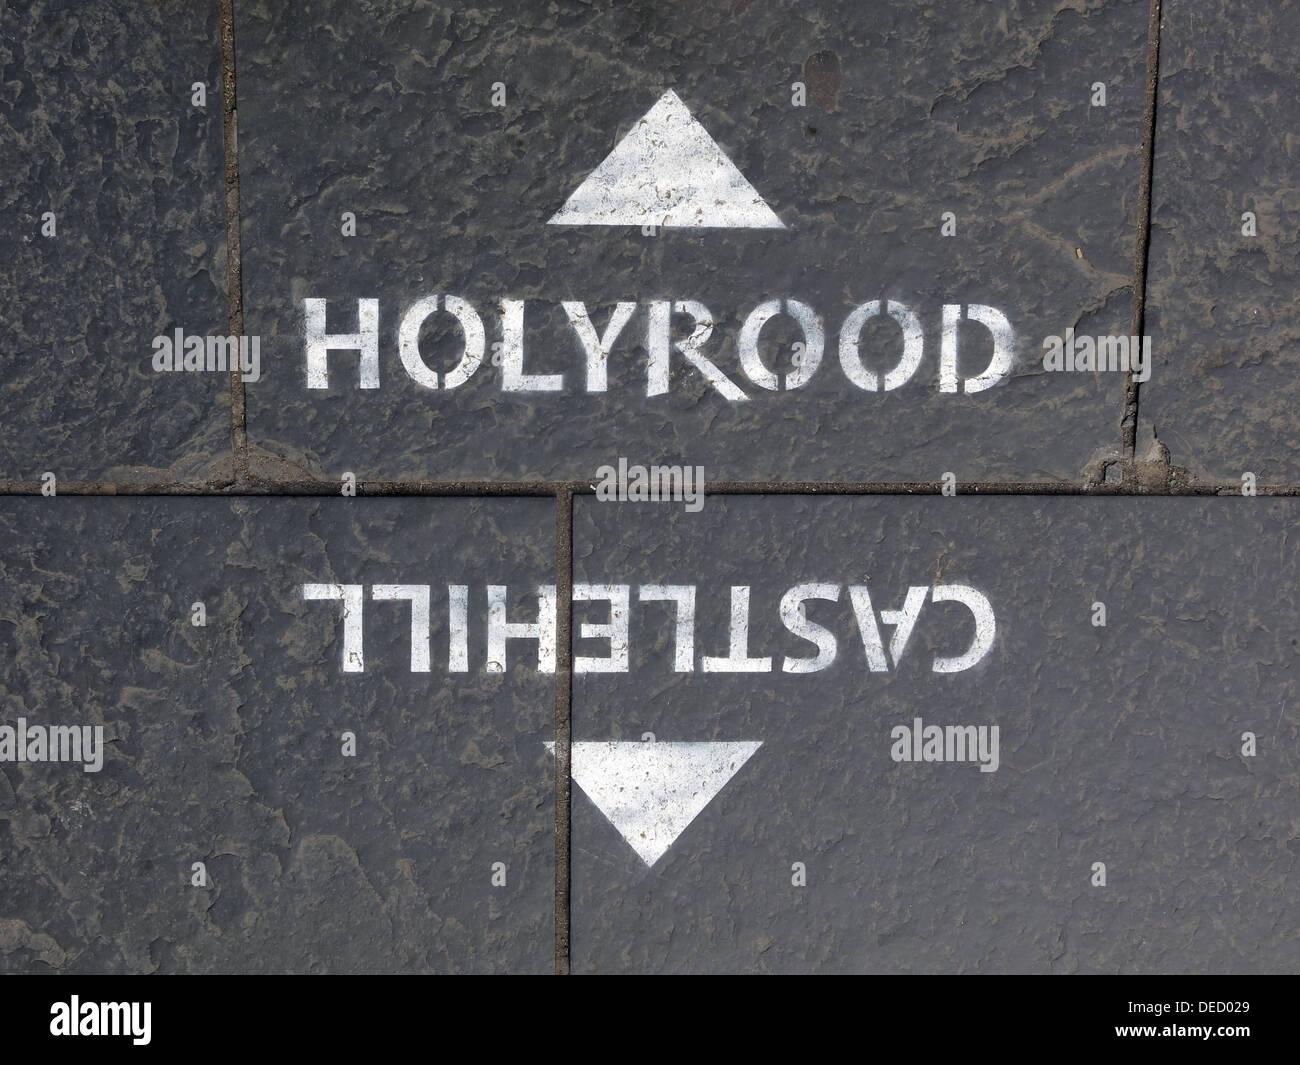 Royal,Mile,Edinburgh,Scotland,UK,signage,parliament,SNP,choice,choices,arrow,on,path,gotonysmith,Buy Pictures of,Buy Images Of